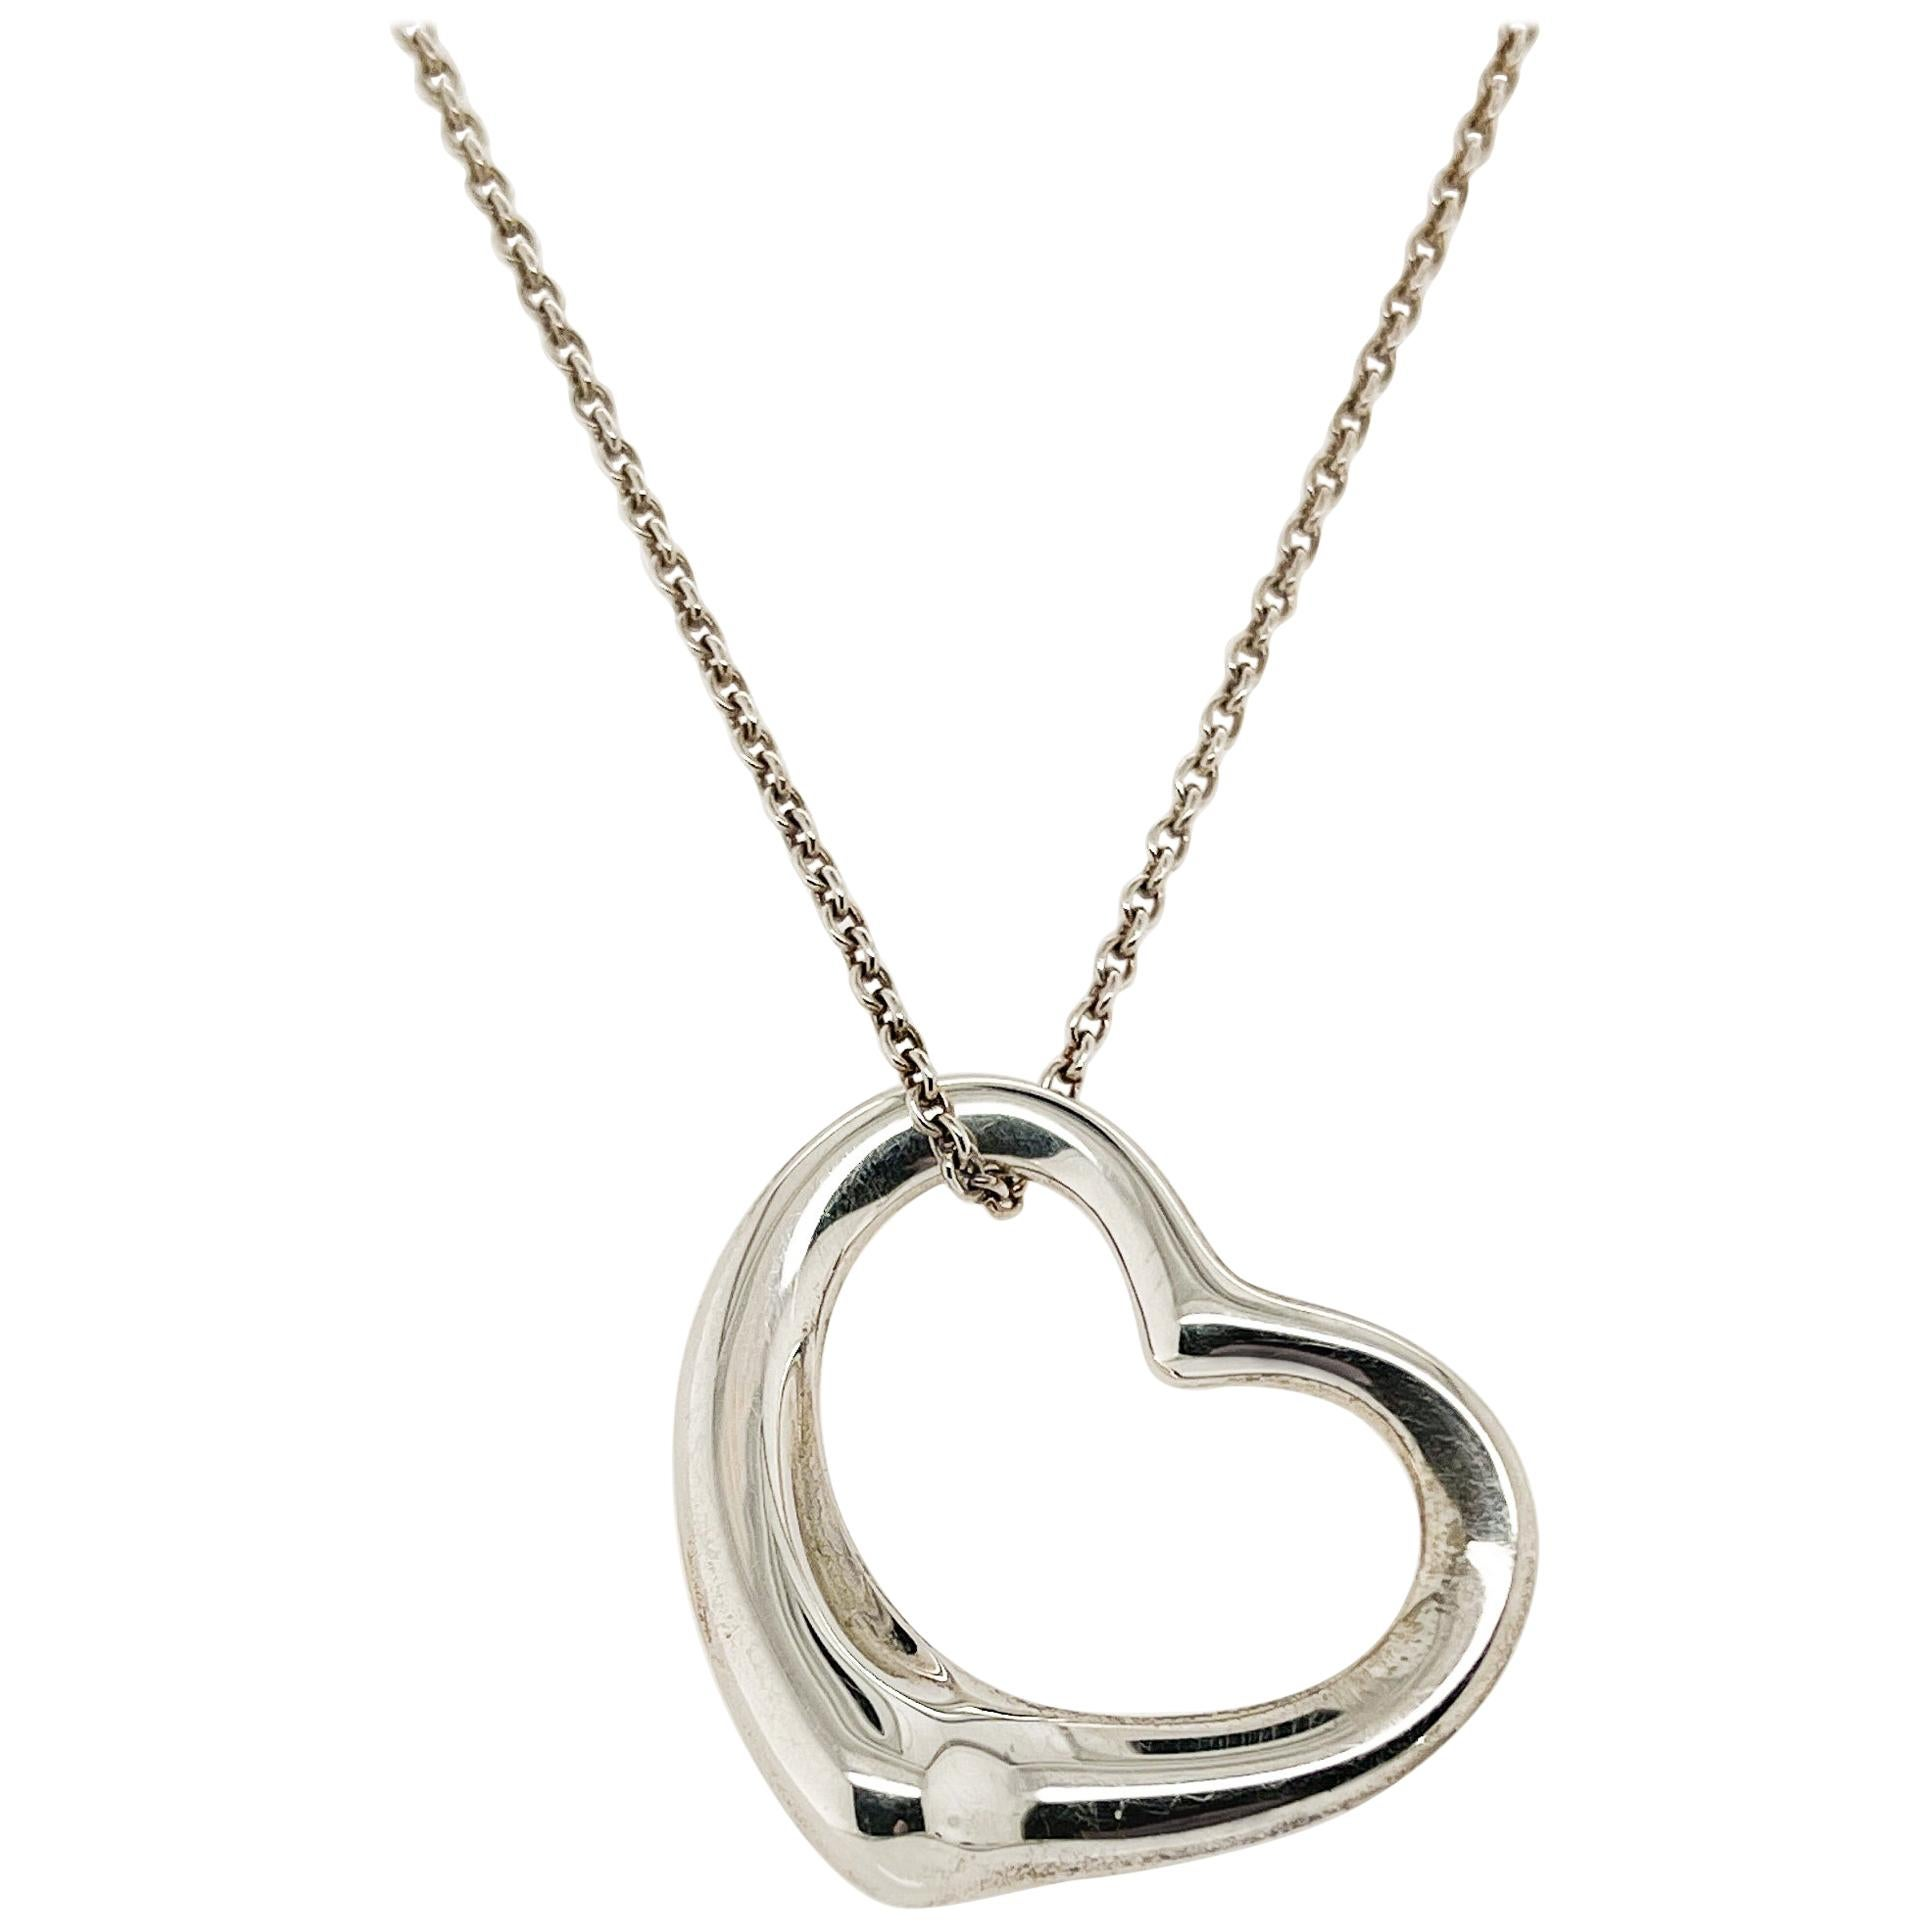 Large Tiffany & Co. Elsa Peretti Sterling Silver Open Heart Pendant Necklace